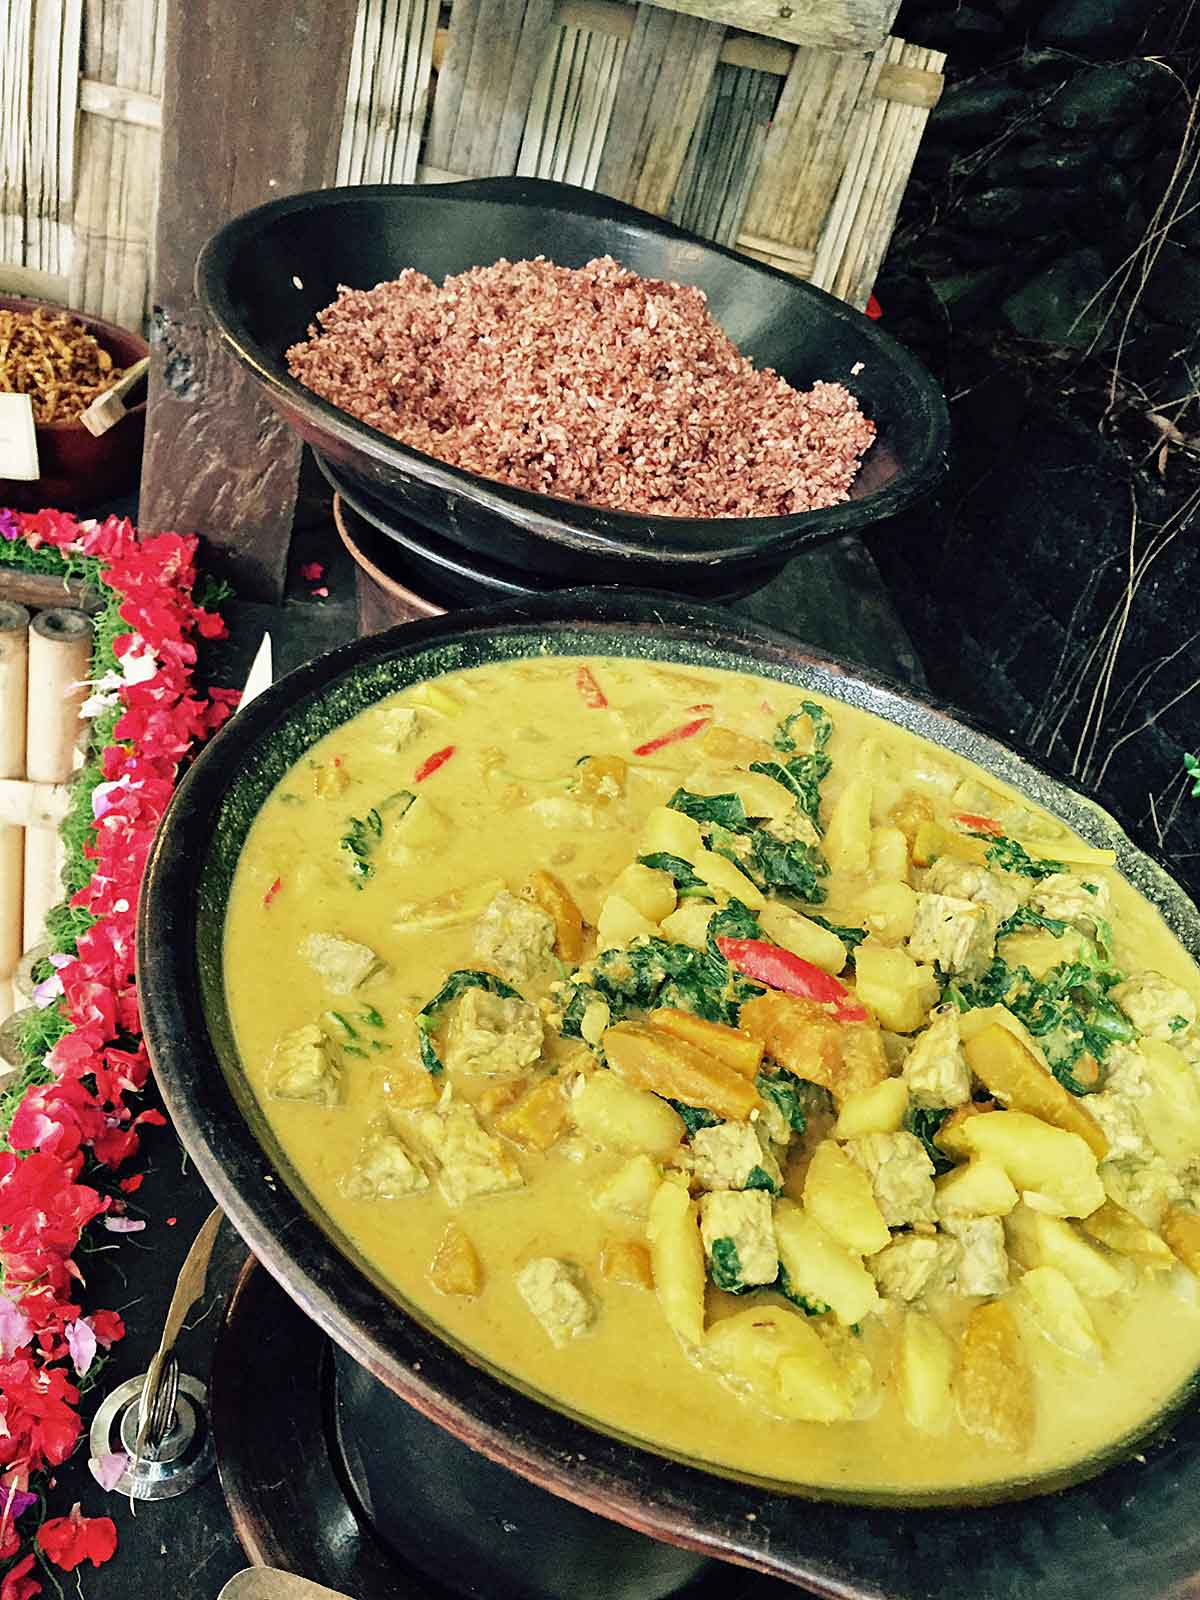 More vegetarian food from Ubud, Bali.